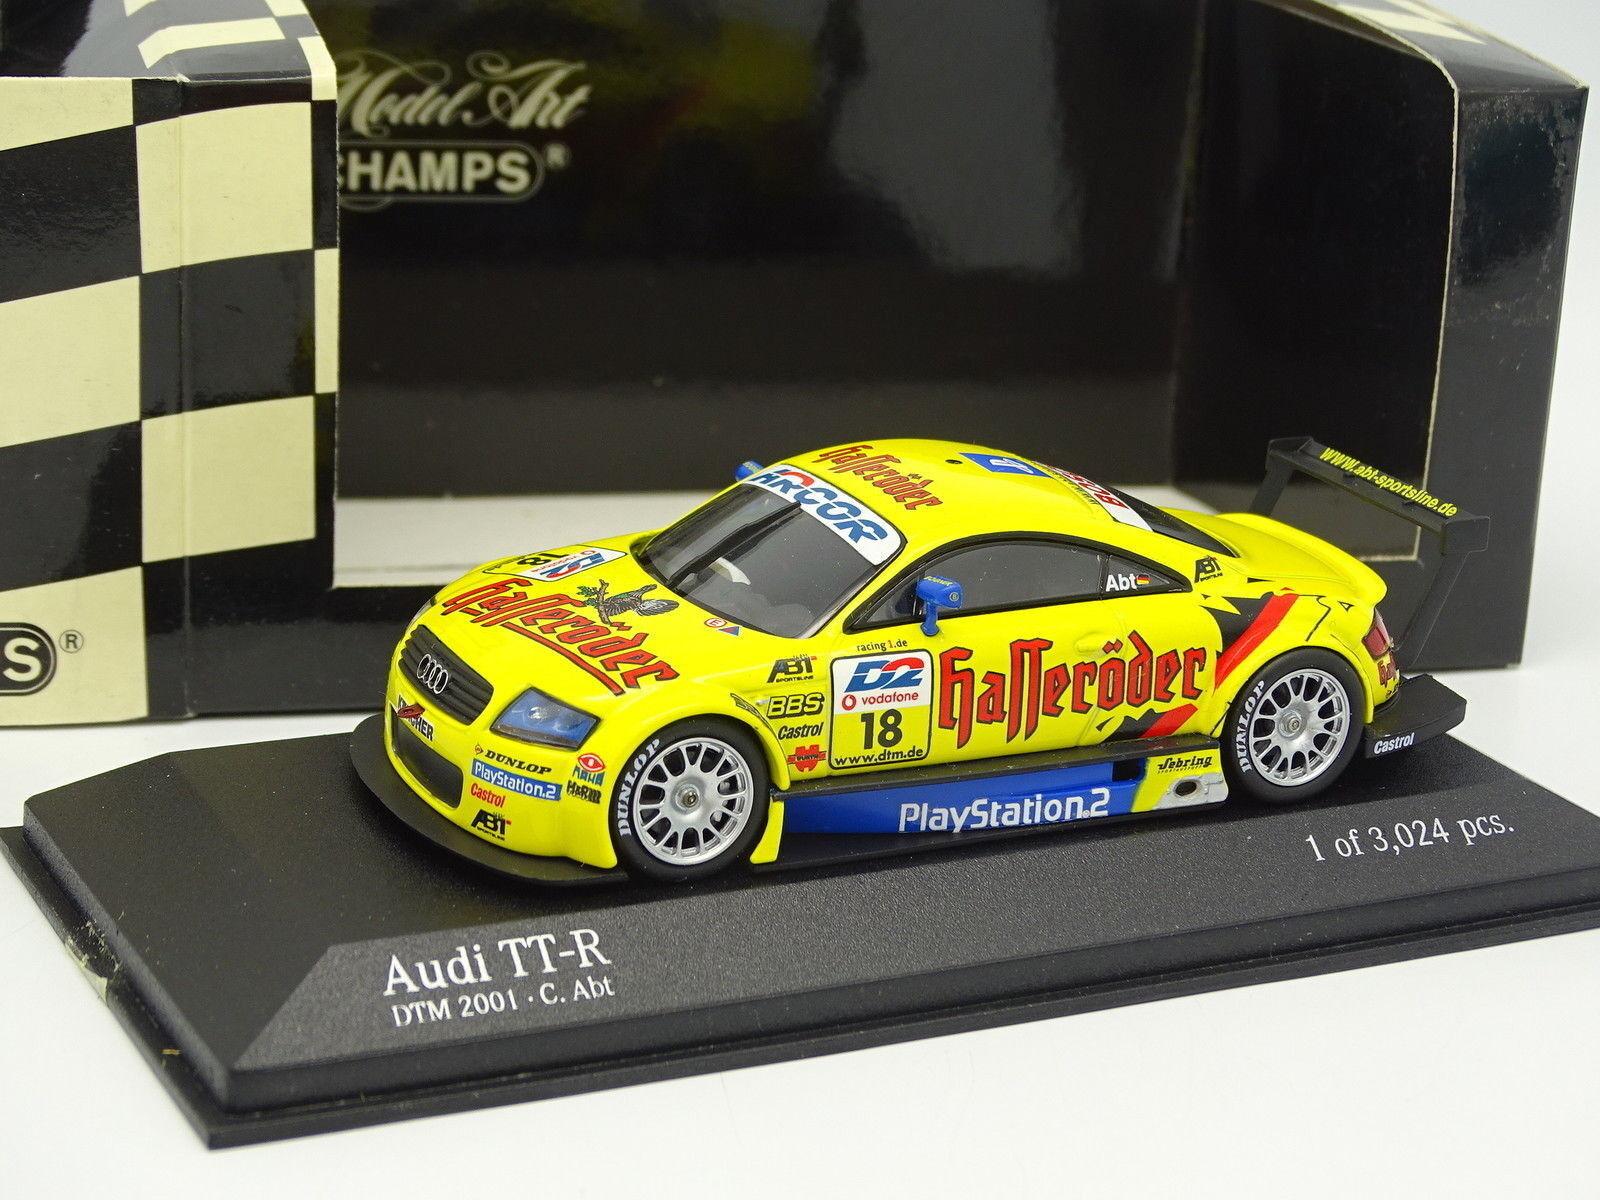 Con 100% de calidad y servicio de% 100. Minichamps 1 43 43 43 - Audi Tt-r DTM 2001 Team Abt Abt N° 18  perfecto